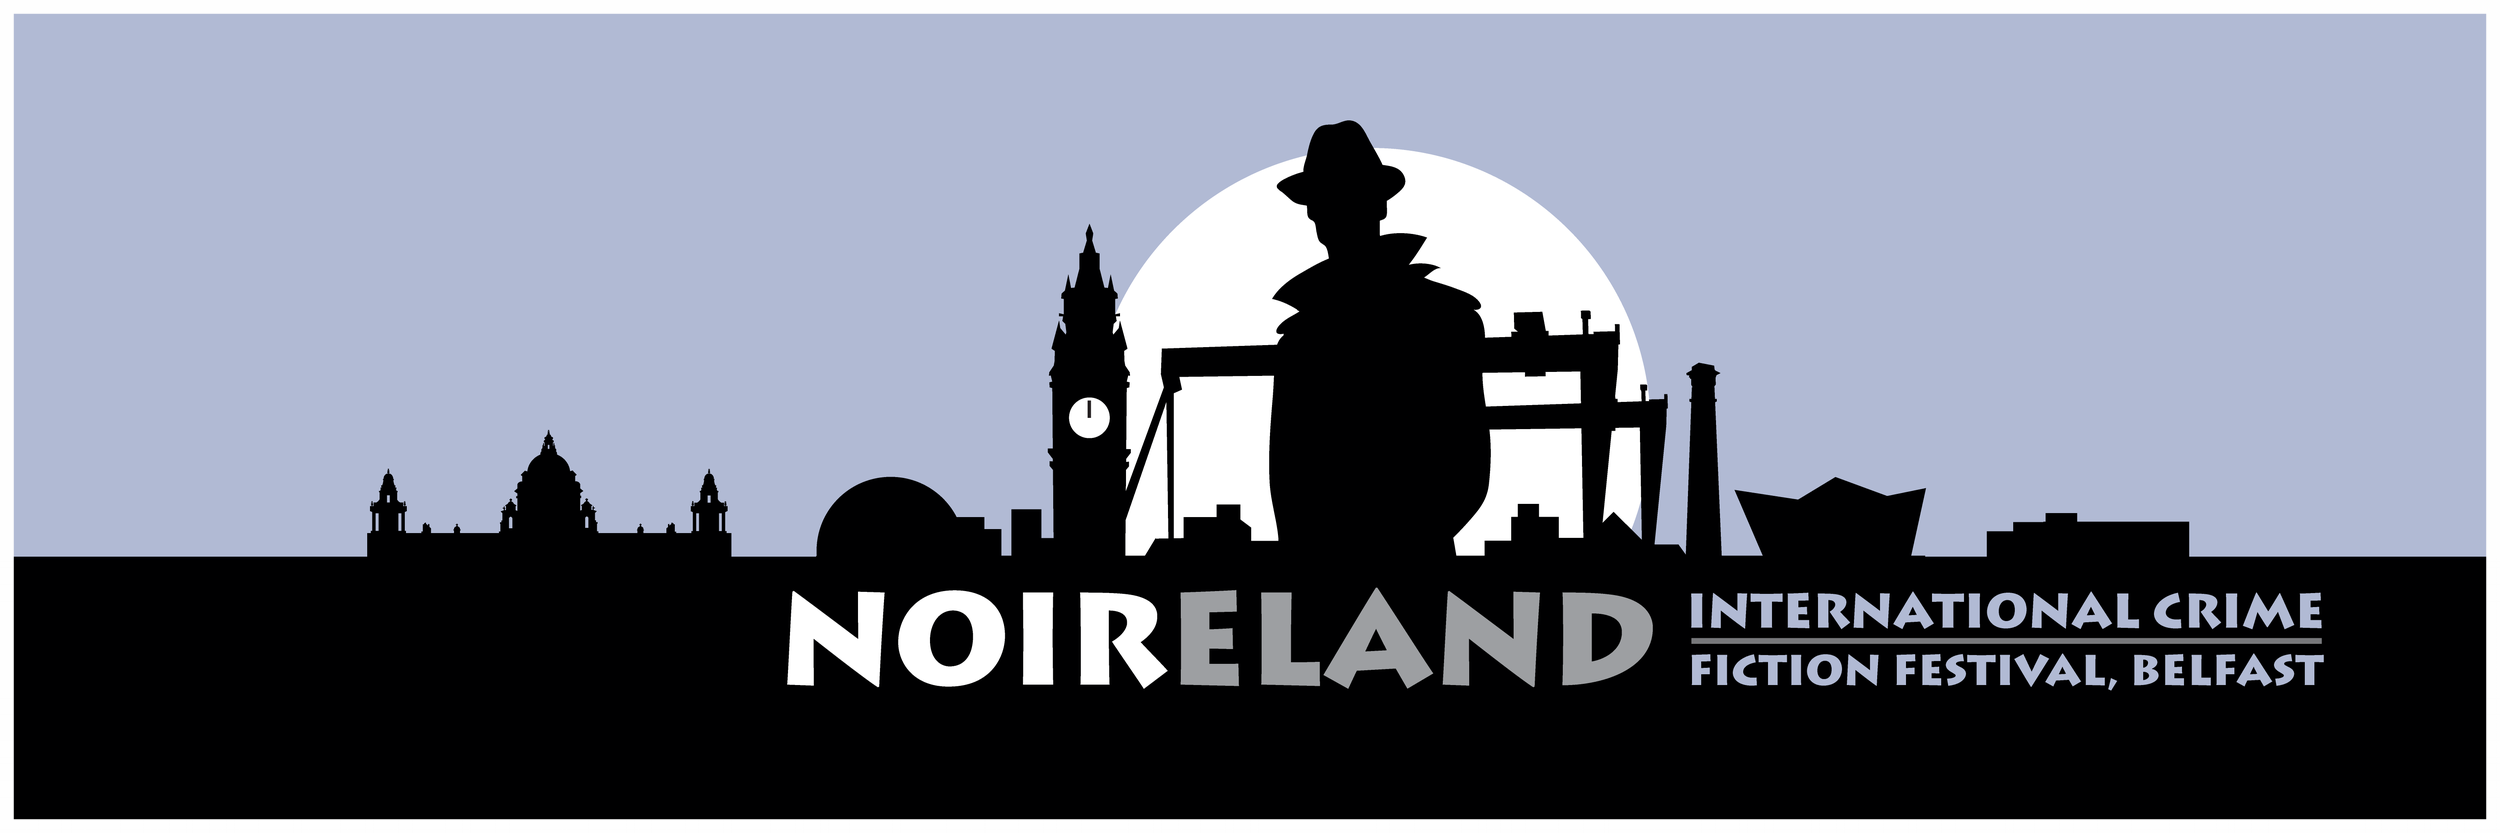 Noireland Twitter Header-01.png